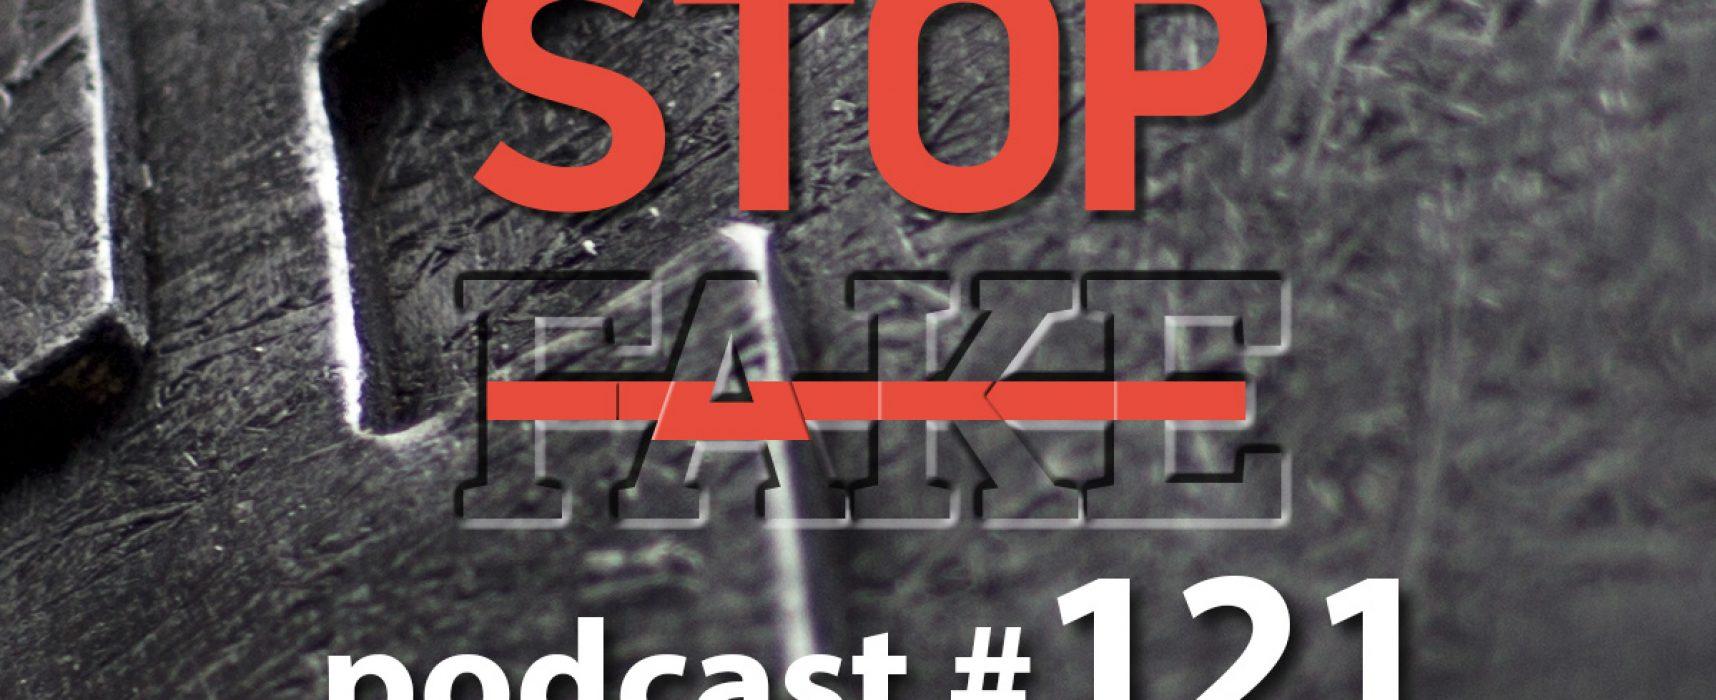 StopFake podcast #121